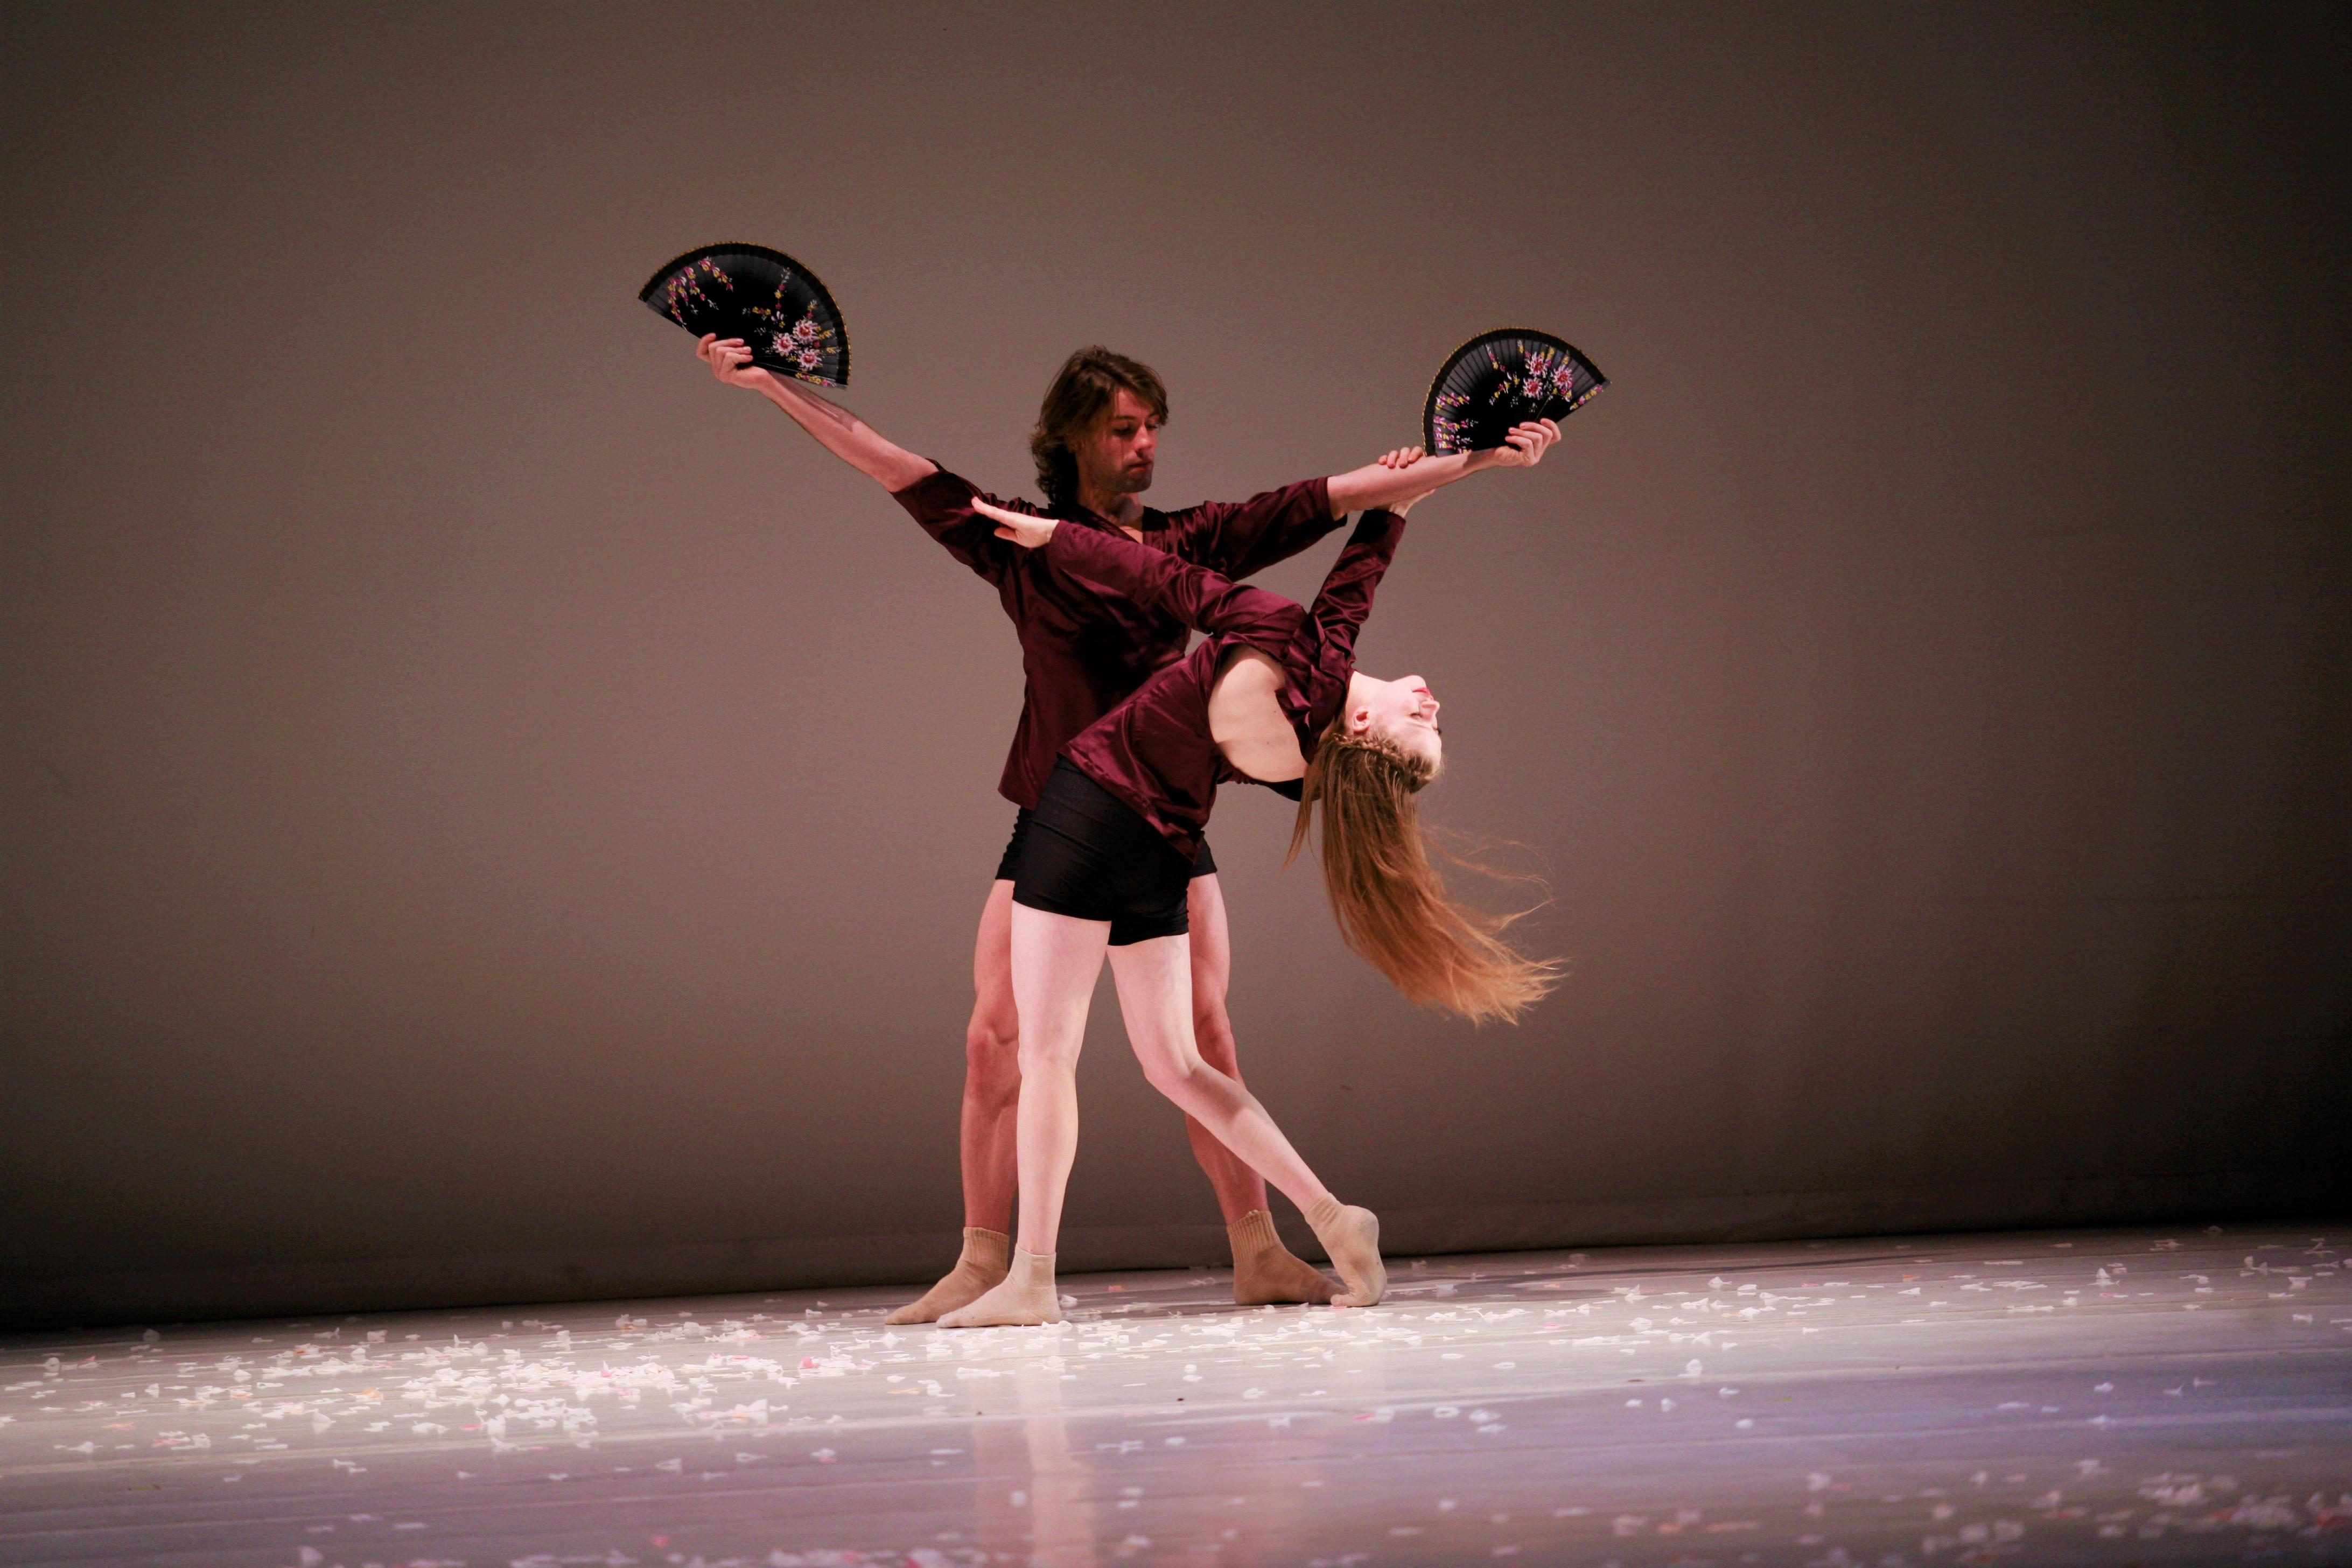 Flora and Zephyr choreographed by Matjash Mrozewski